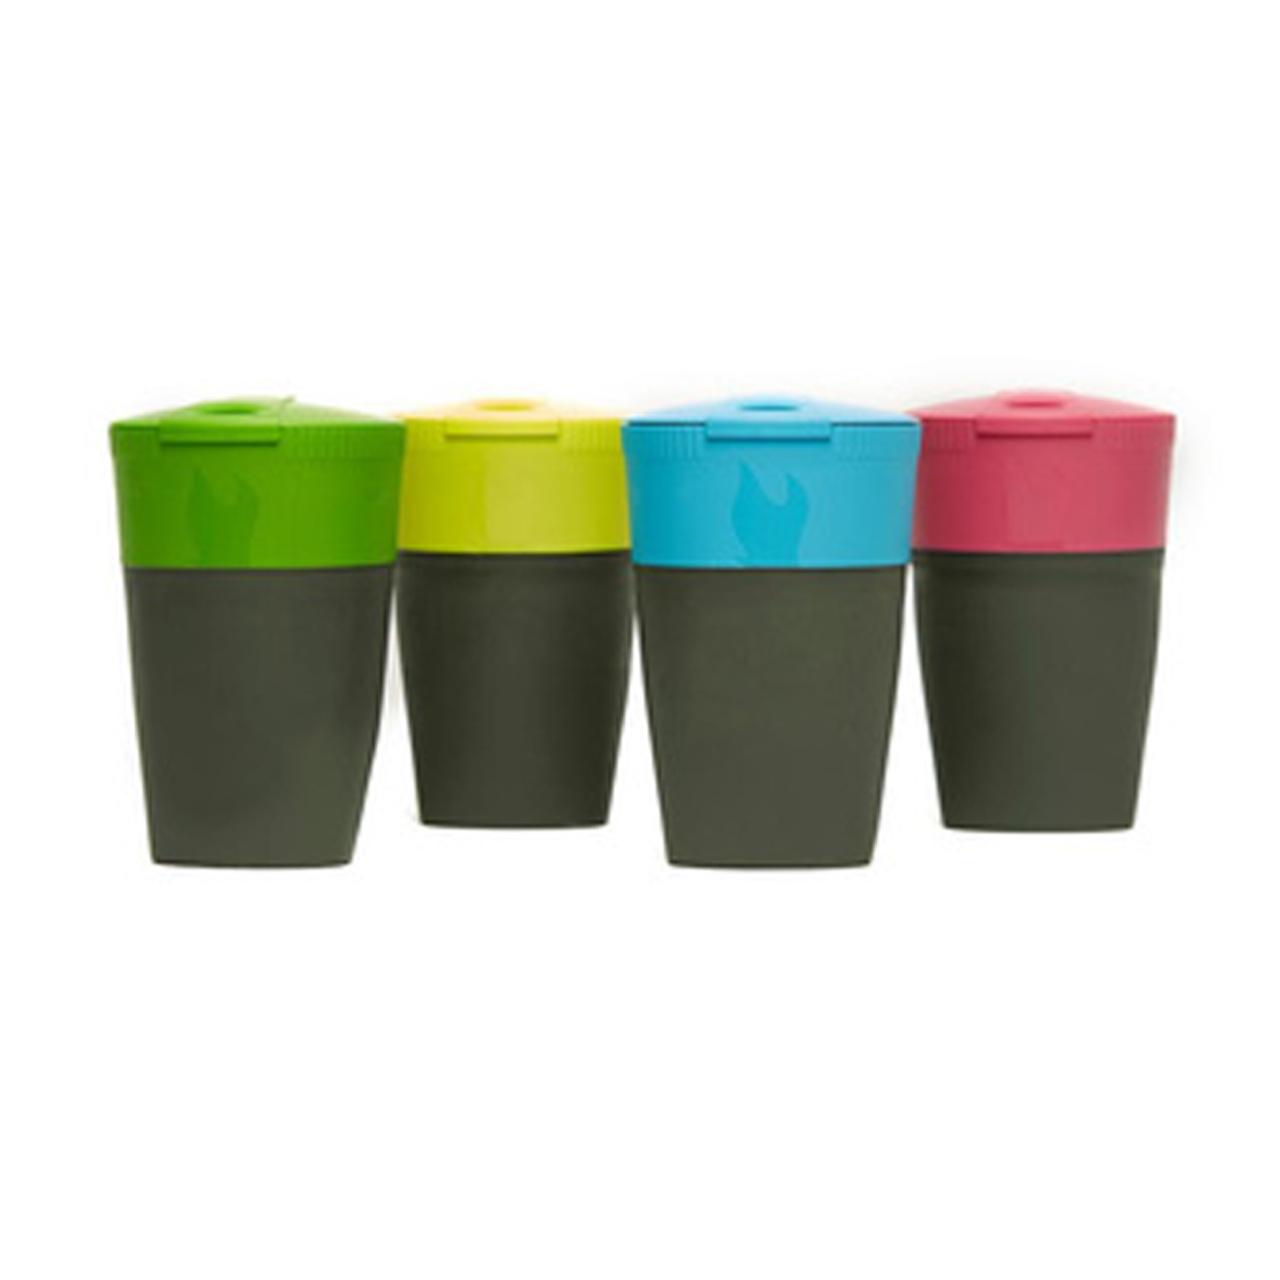 لیوان لایت مای فایر مدل Pack-up-Cup بسته 4 عددی